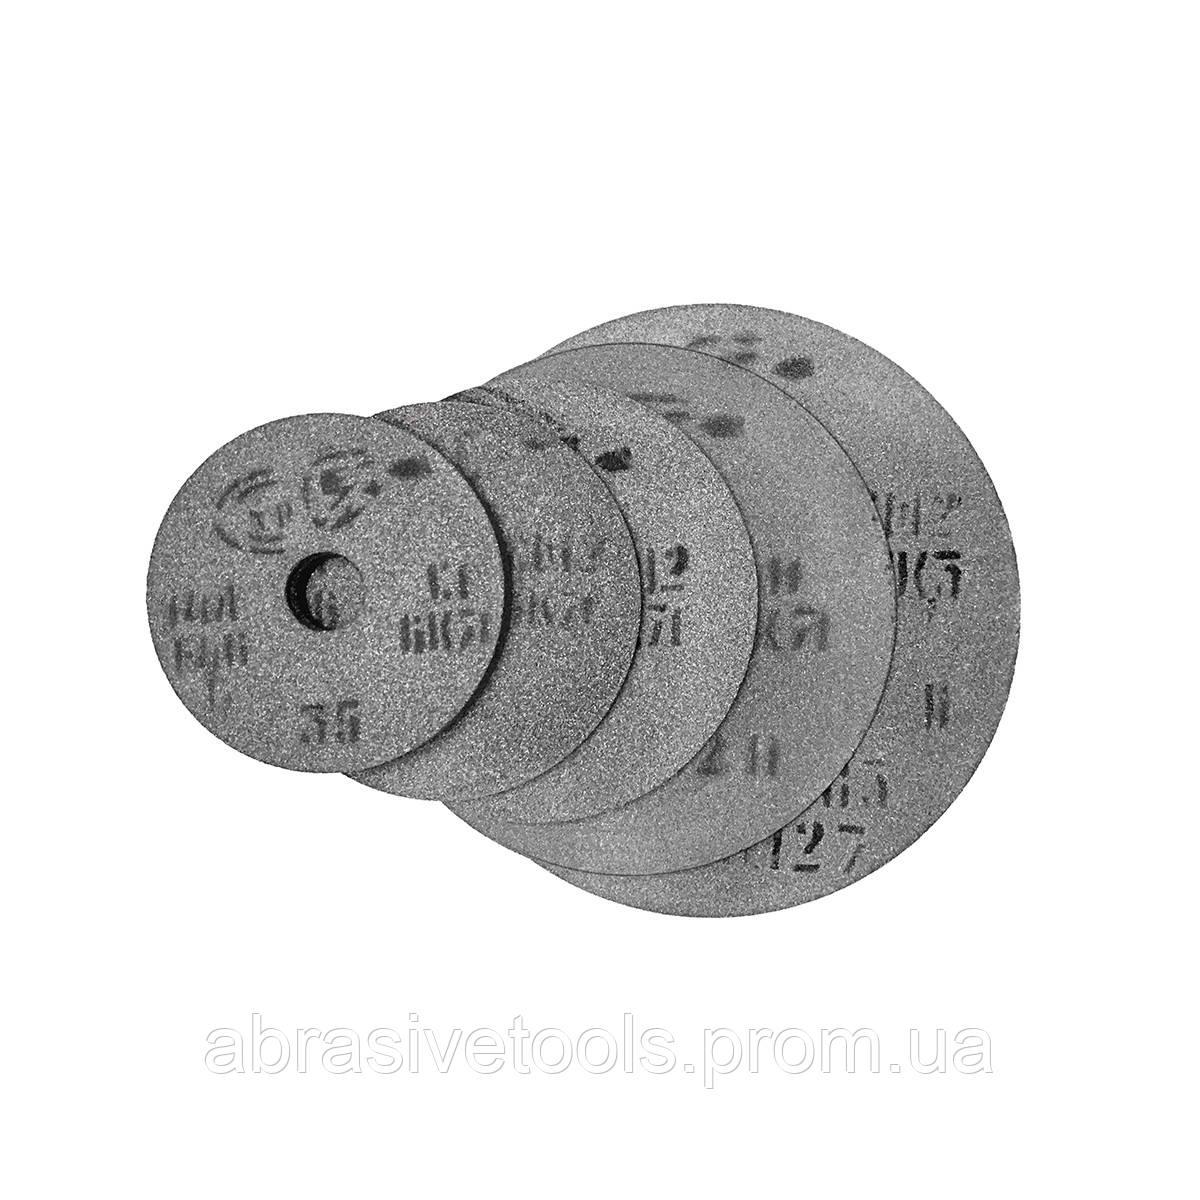 Круг шлифовальный 14A 500х80х203  F60 С